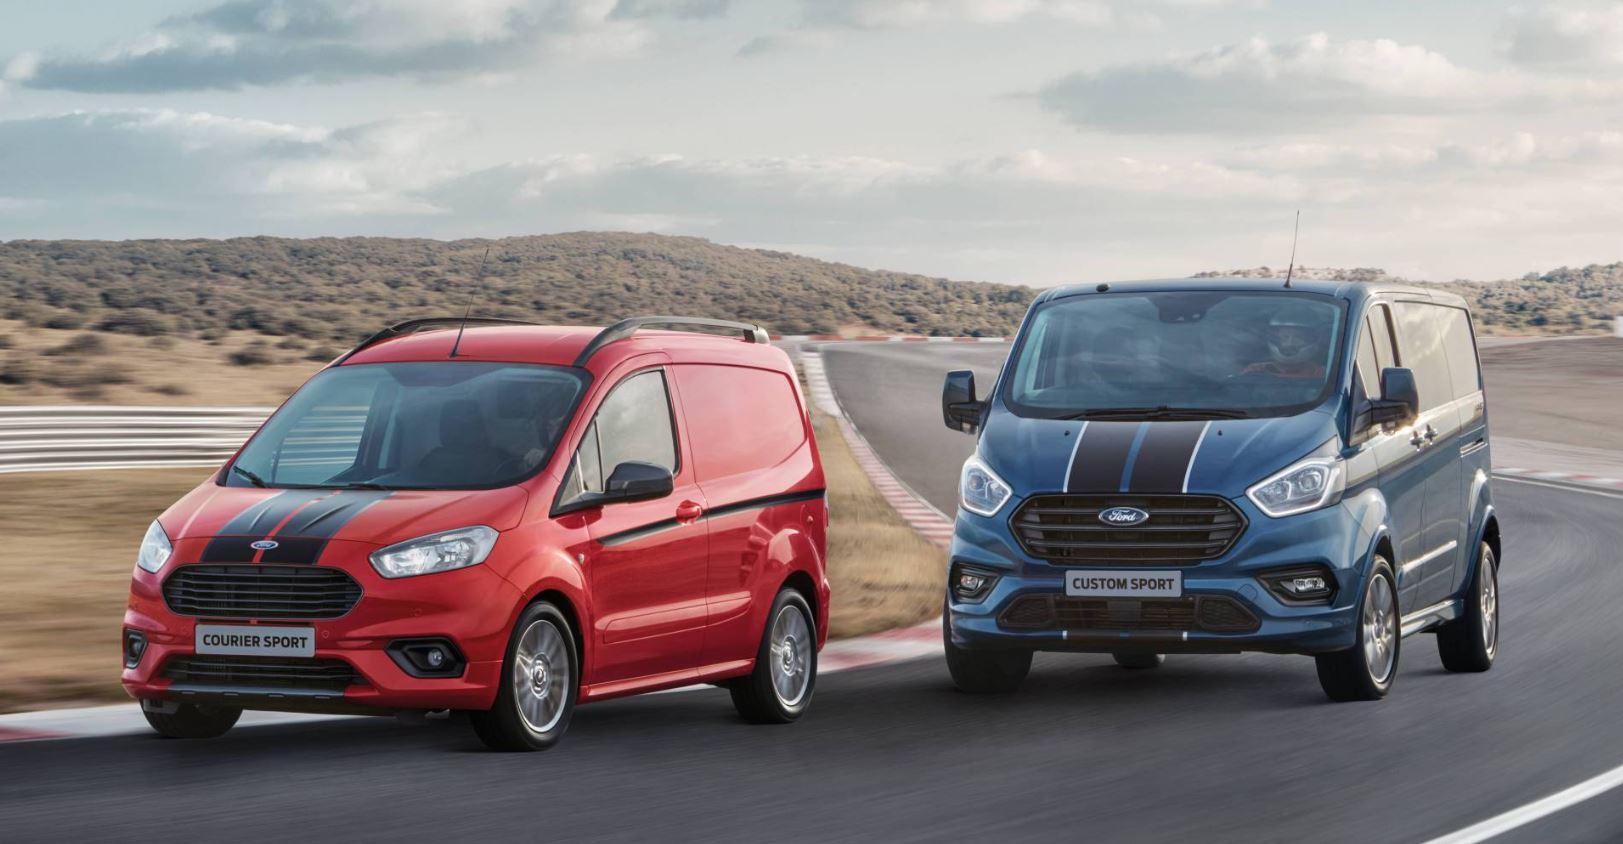 Ford presenta la Ford Transit Custom Sport: ¡Hasta 185 caballos de potencia!